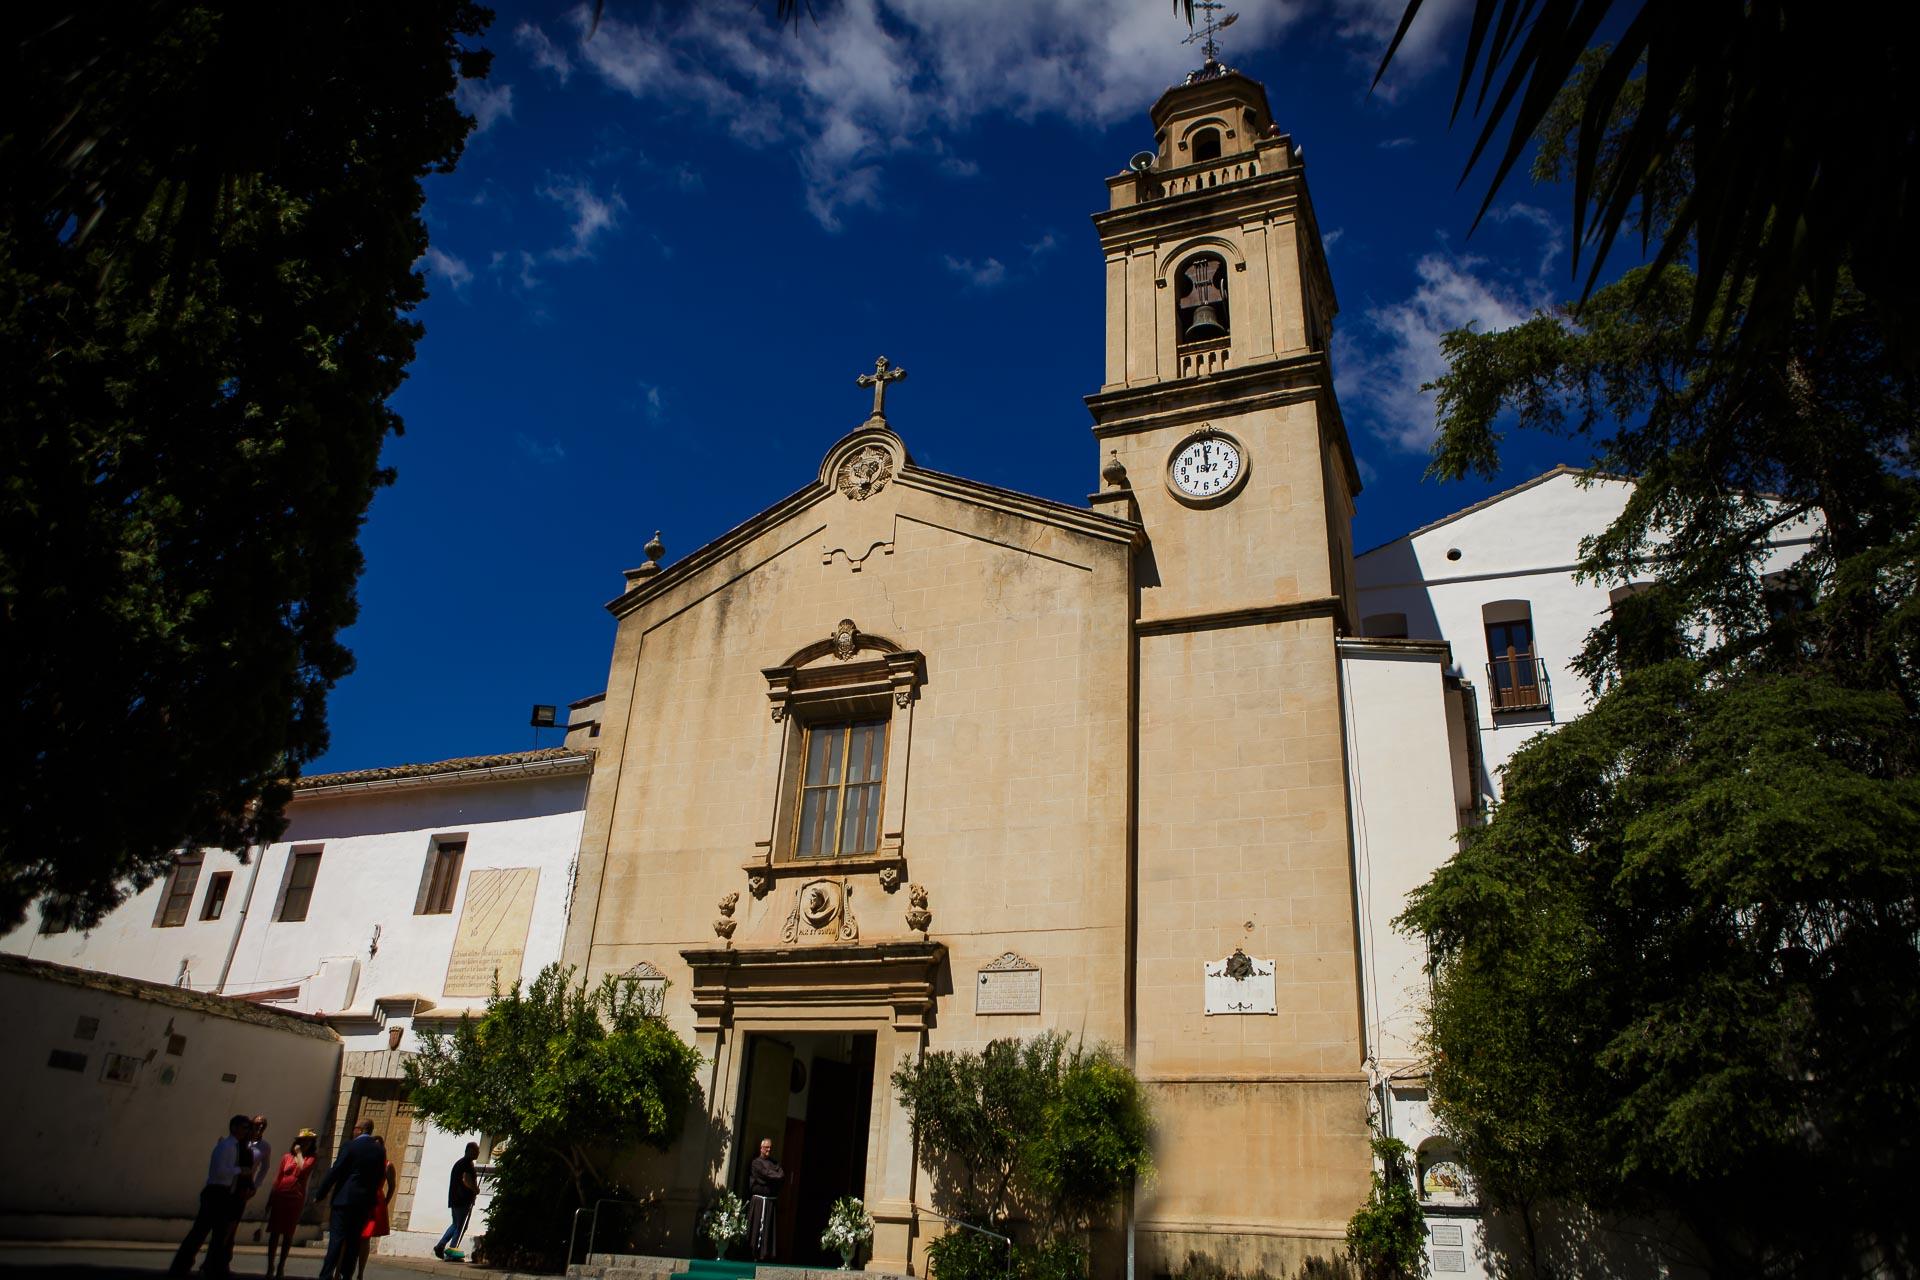 Reportaje Boda en El Huerto Santa María Carolina y Ramón, Monasterio Santo Espíritu Gilet. Christian Roselló Fotógrafo de Bodas en Valencia.